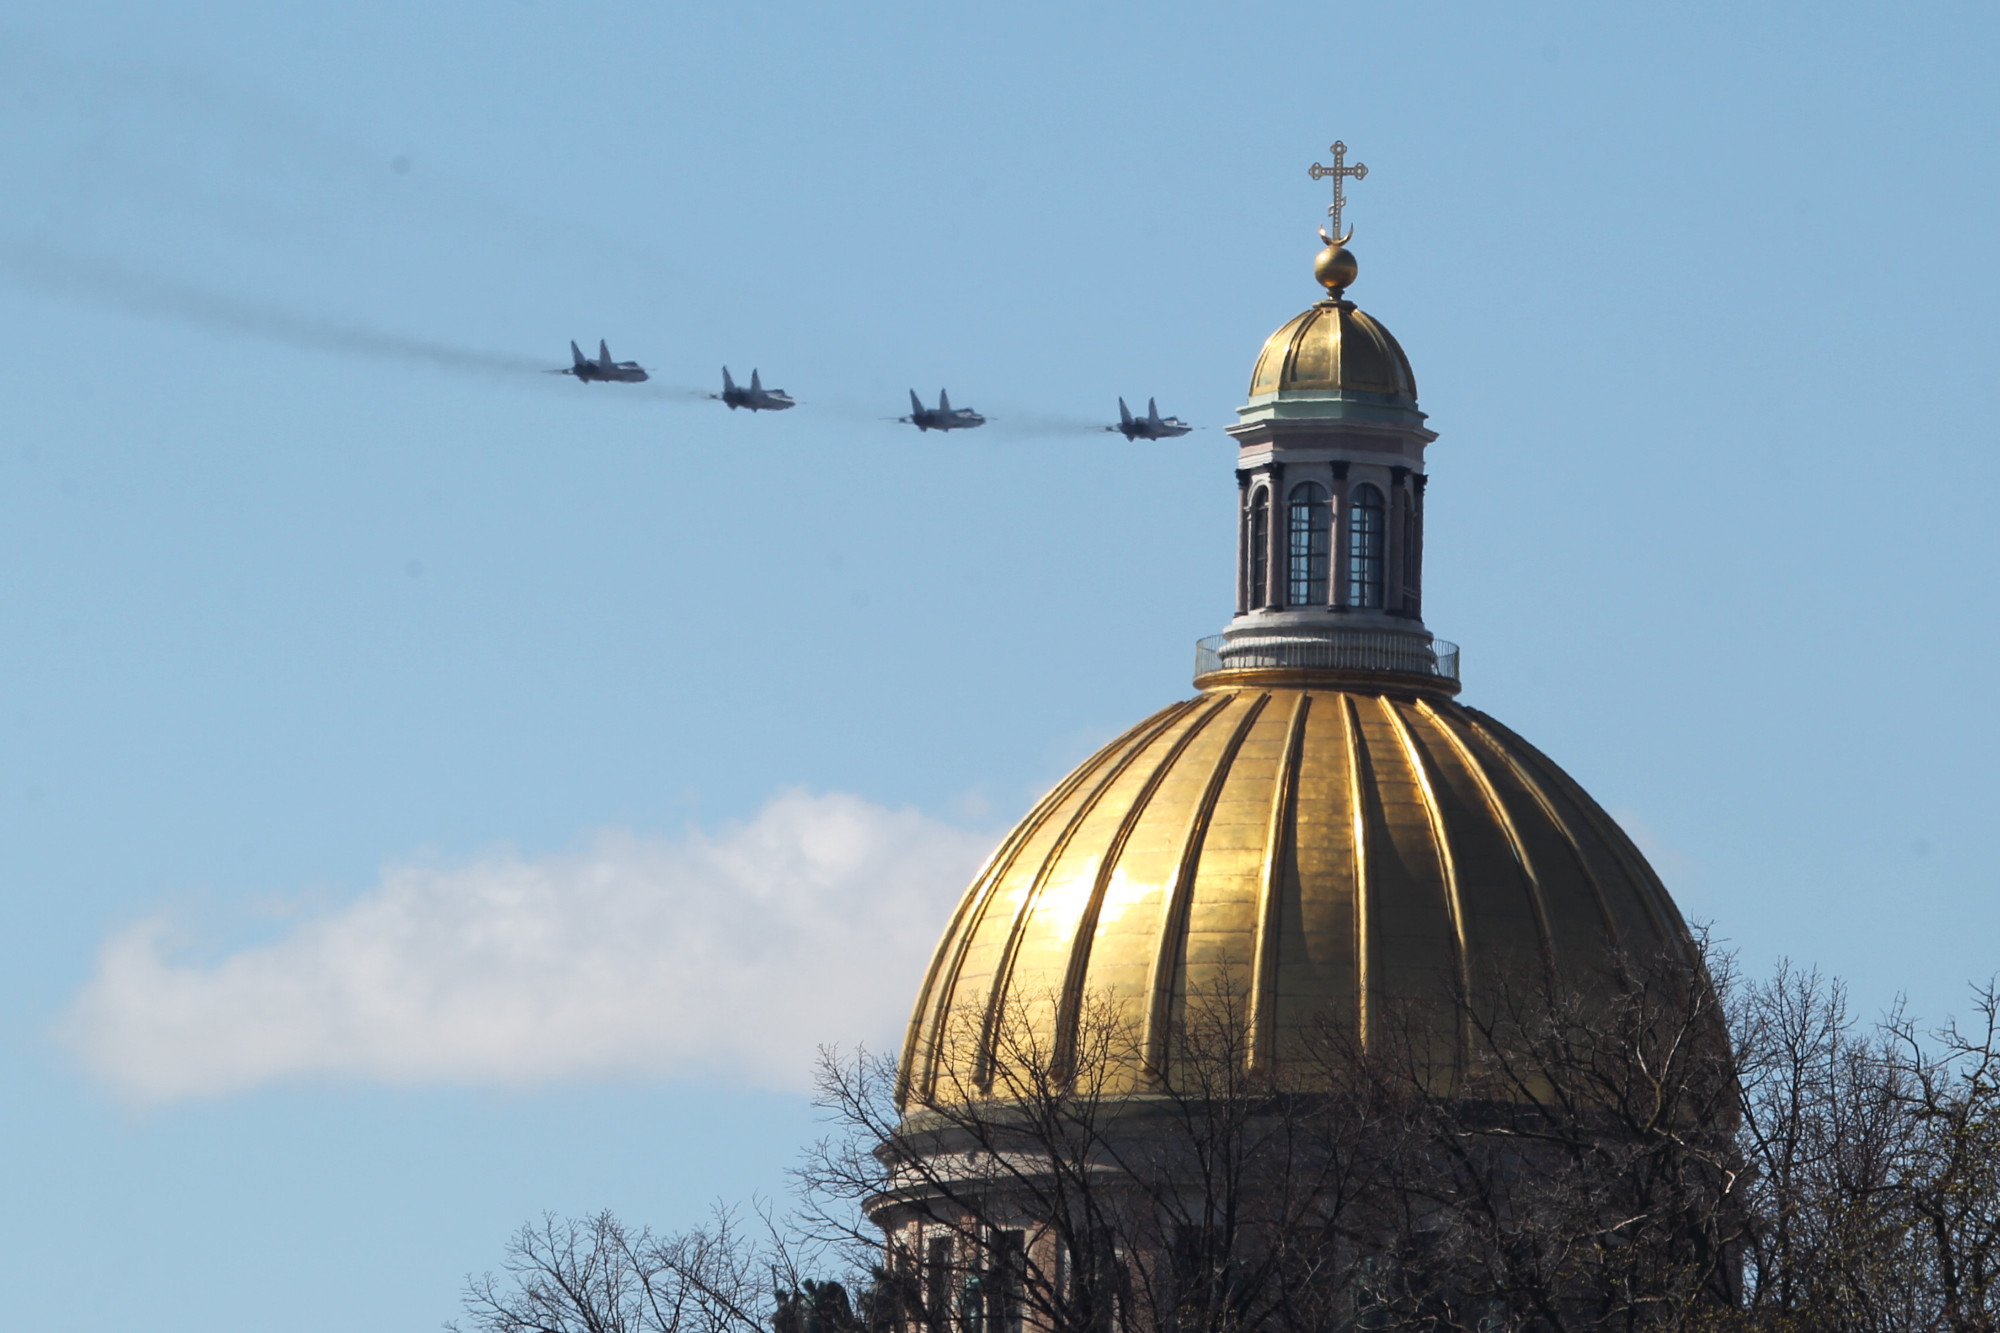 парад победы, день победы, 9 мая, армия, авиация, самолёты миг-31